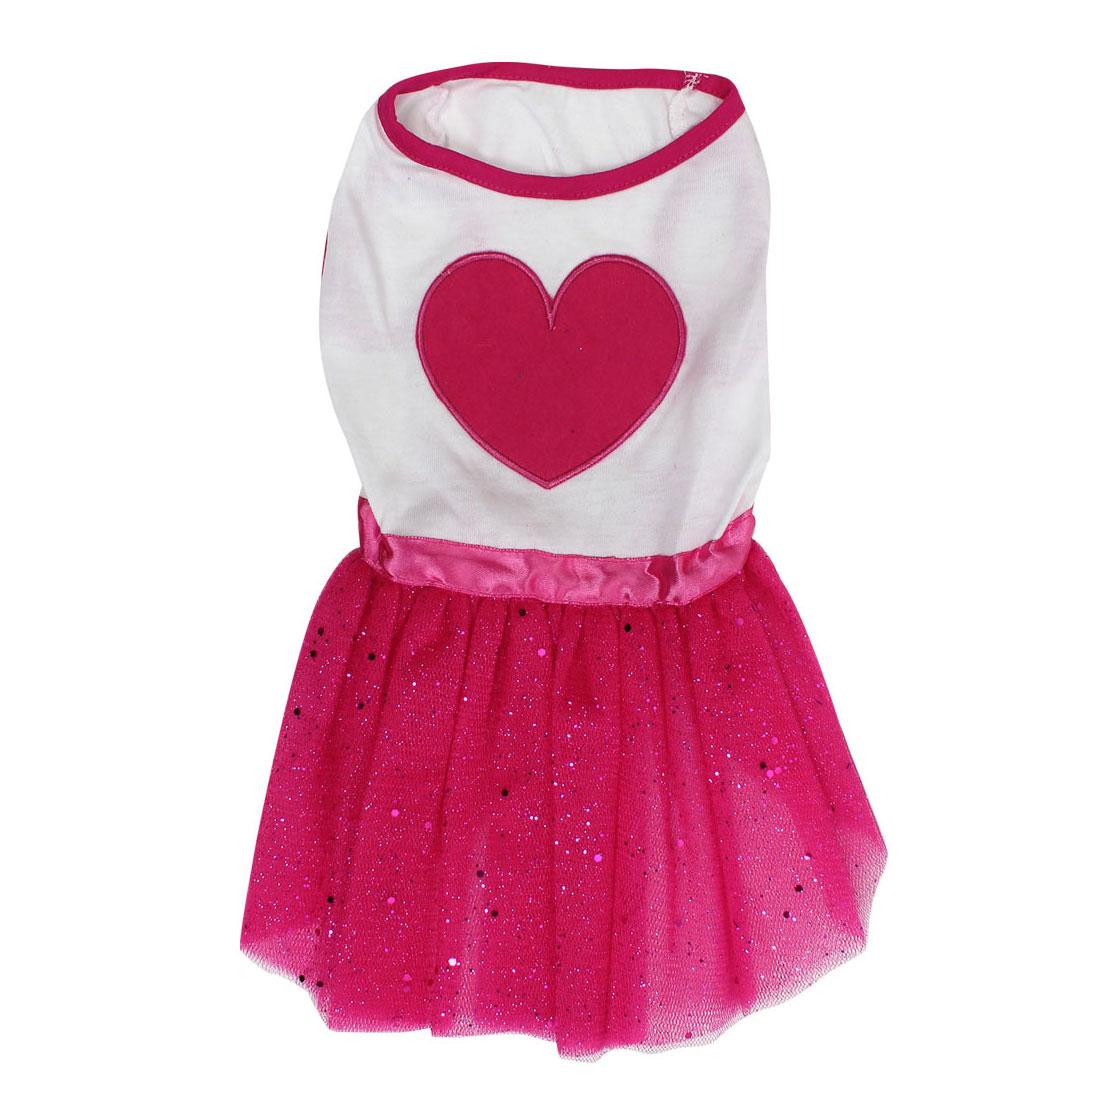 Pet Dog Doggie Heart Shaped Pattern Summer Ballet Dress Skirt White Red Size L